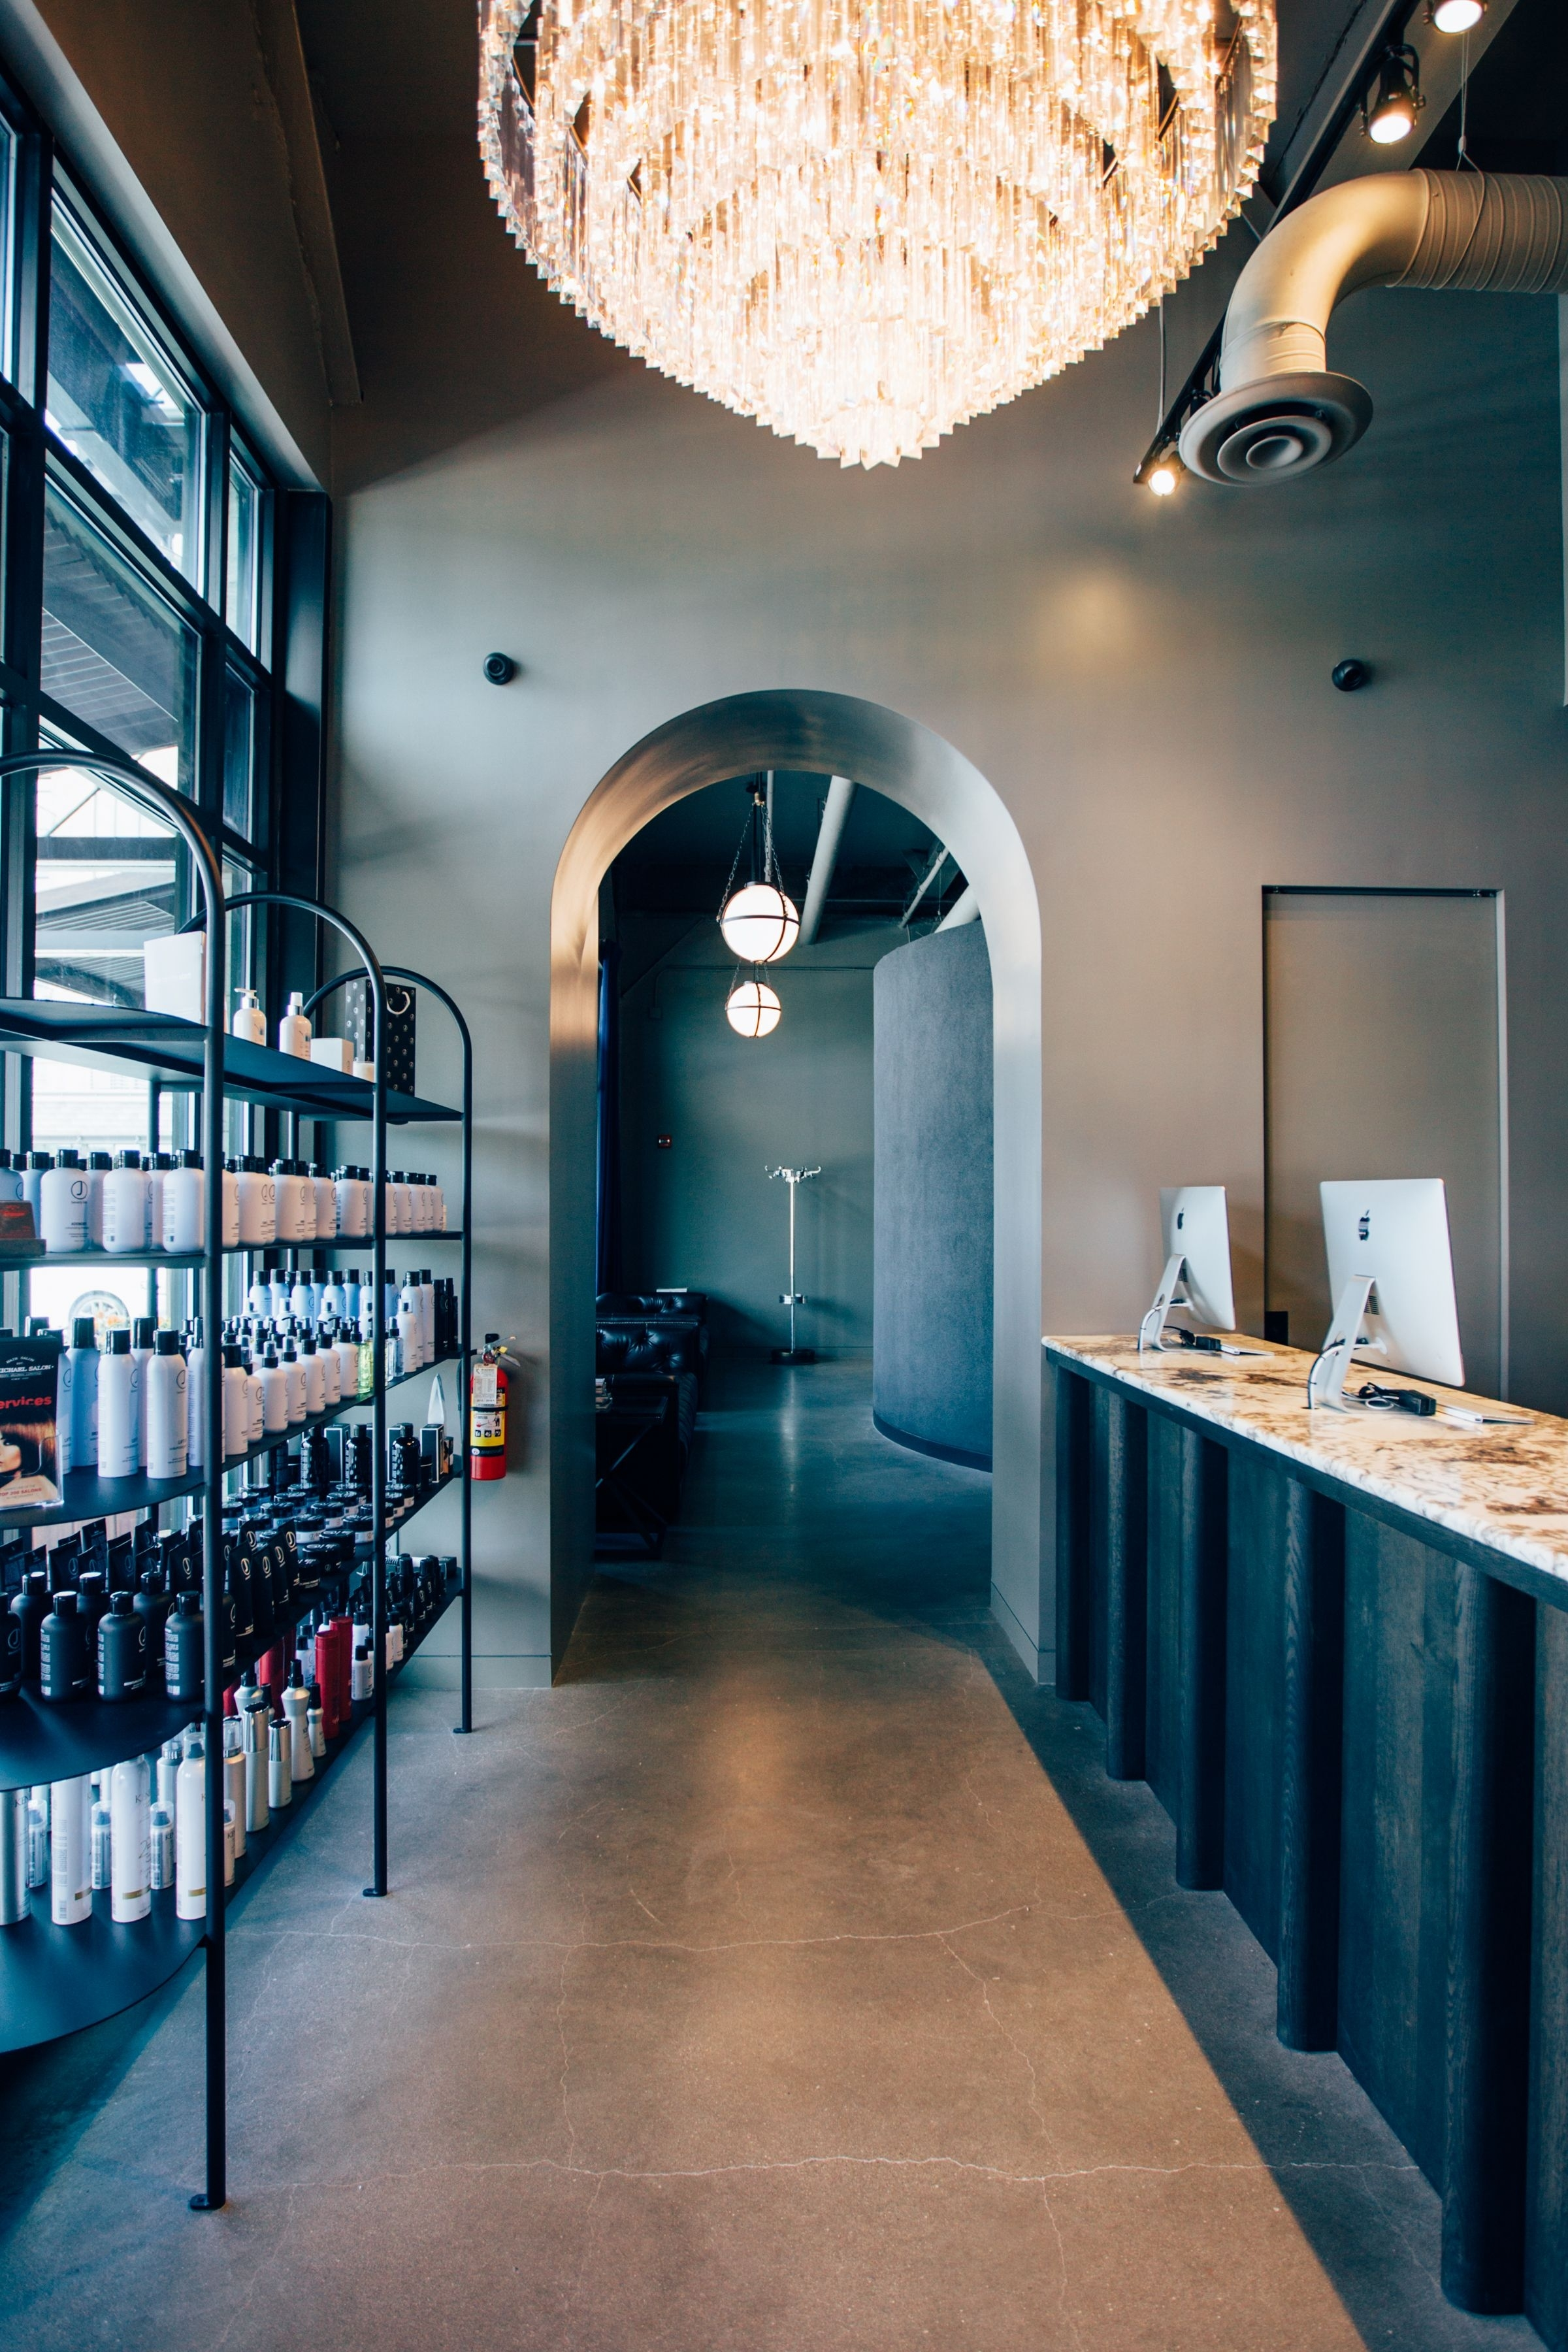 1 Indianapolis Hair Salon Photos - G Michael Salon | Salon And Spa with regard to Haircut Salon And Spa Jakarta